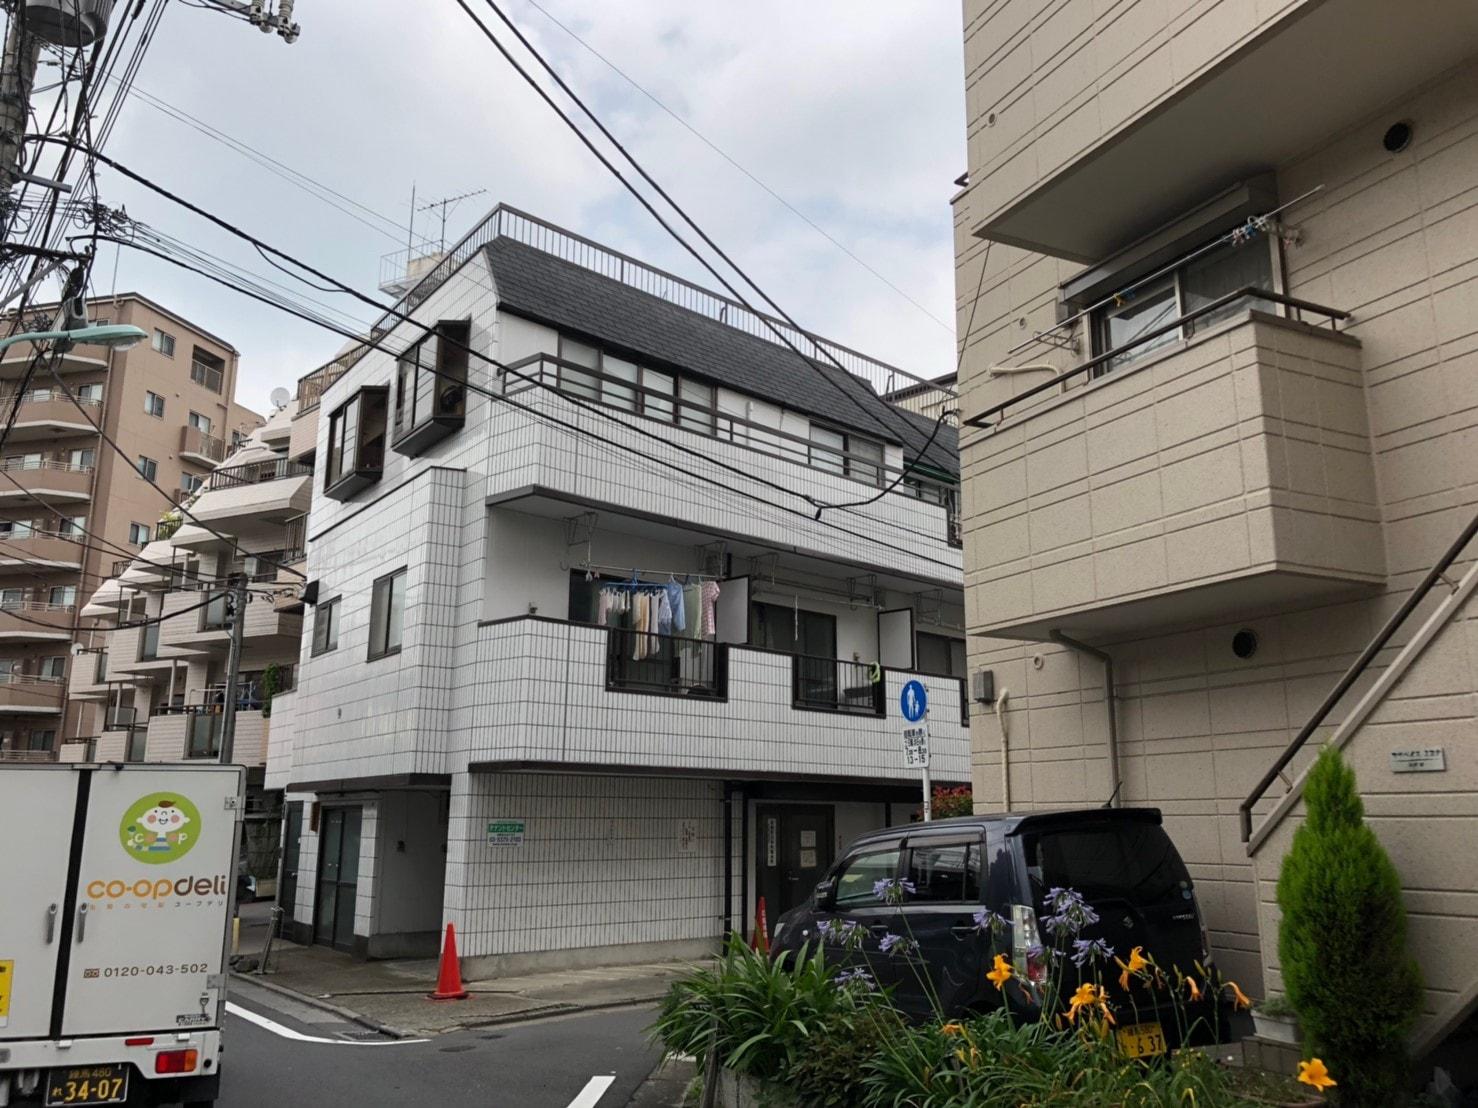 板橋本町駅周辺の住宅街